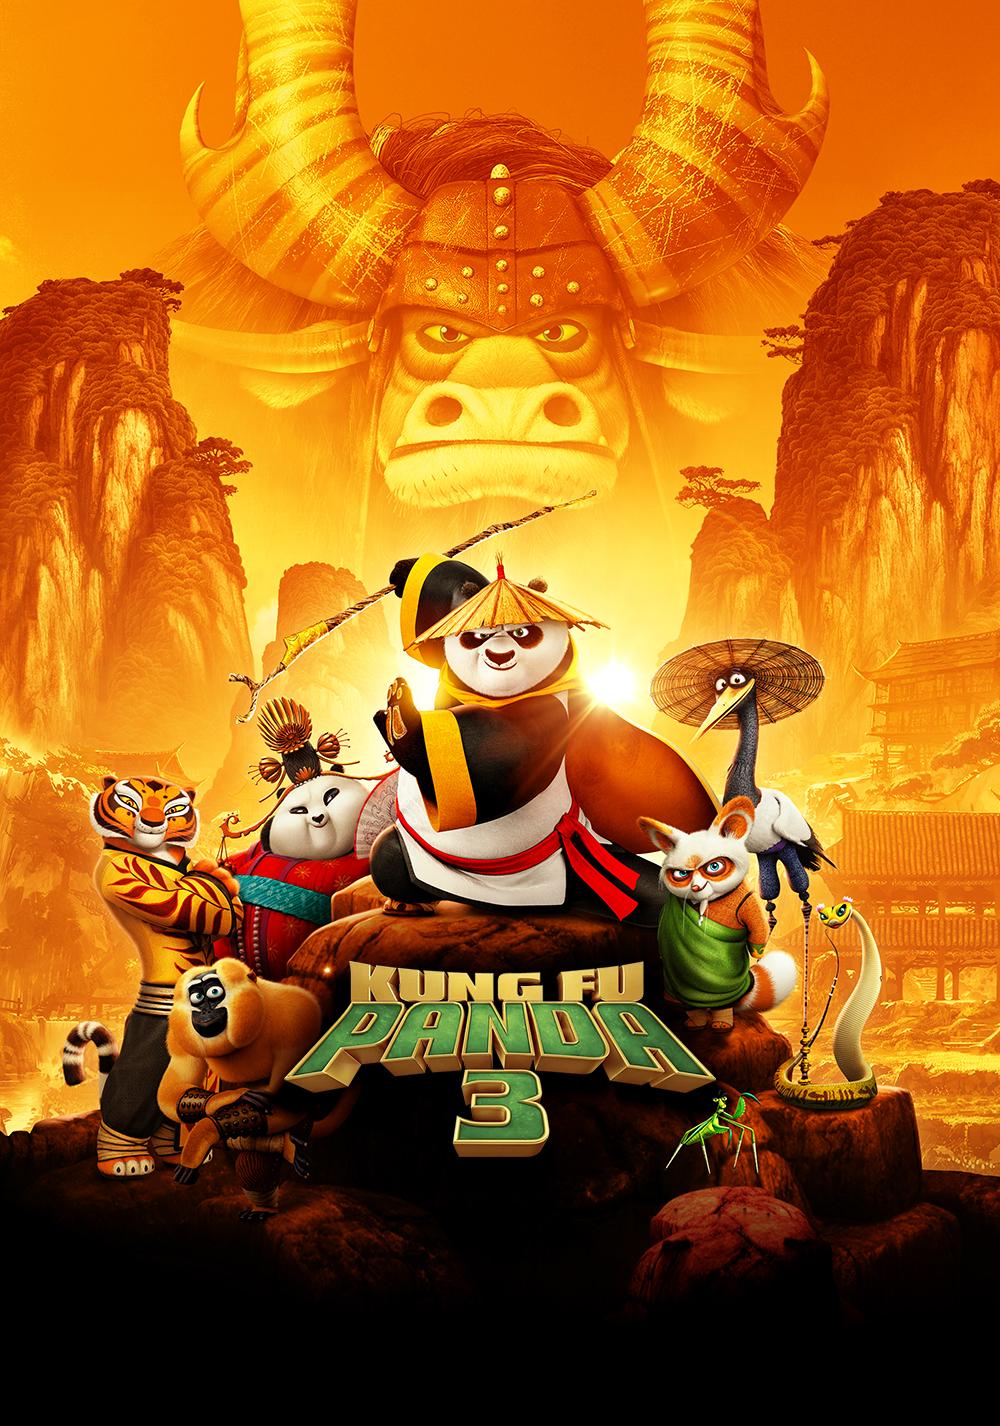 Kung Fu Panda 3 Movie Fanart Fanart Tv